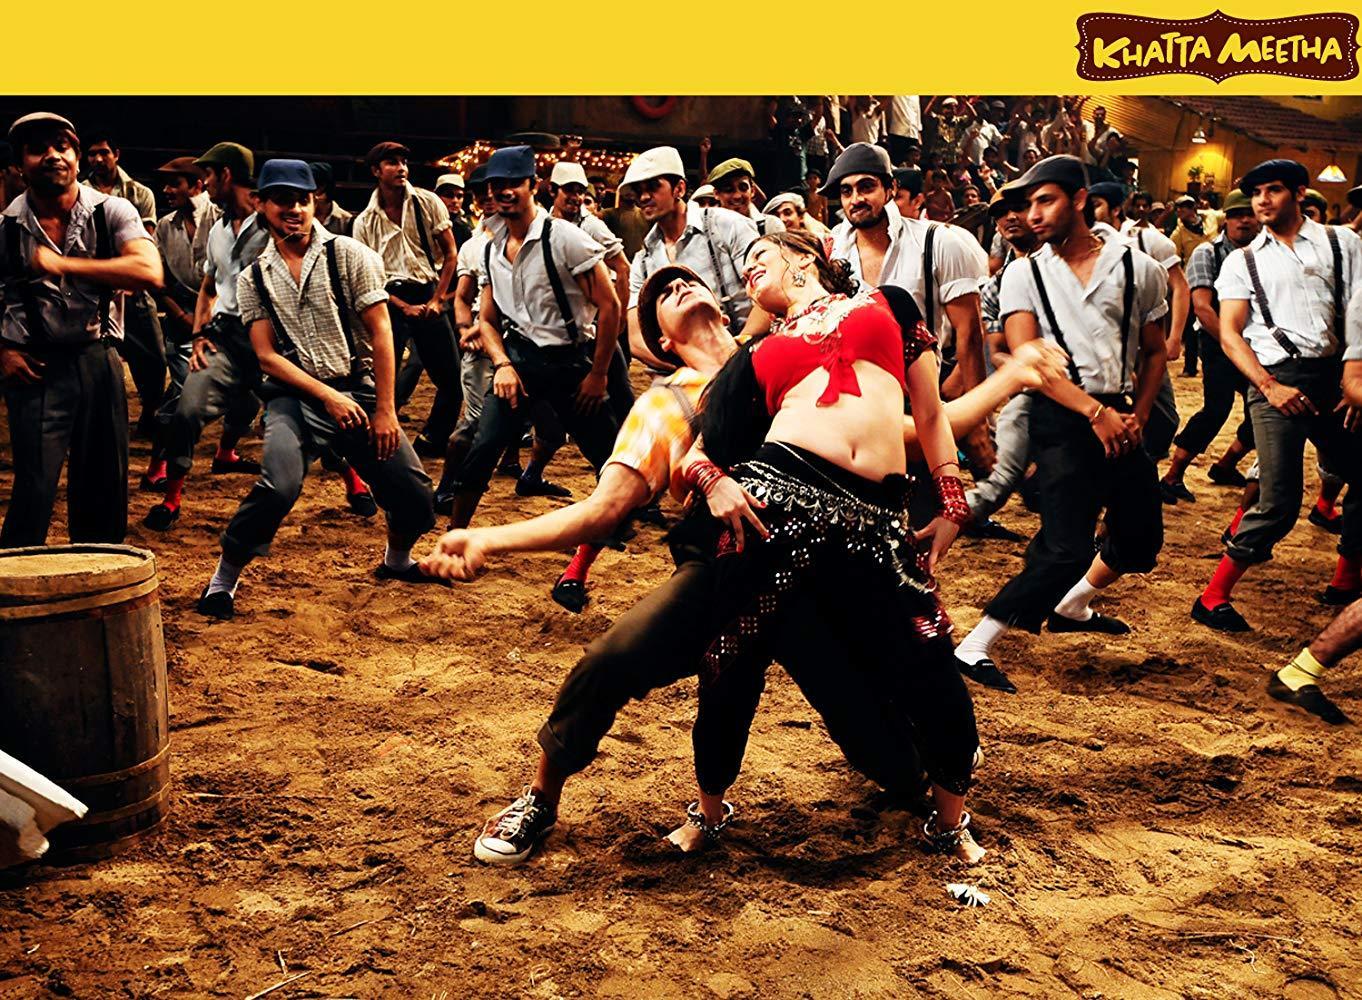 فيلم Khatta Meetha 2010 مترجم